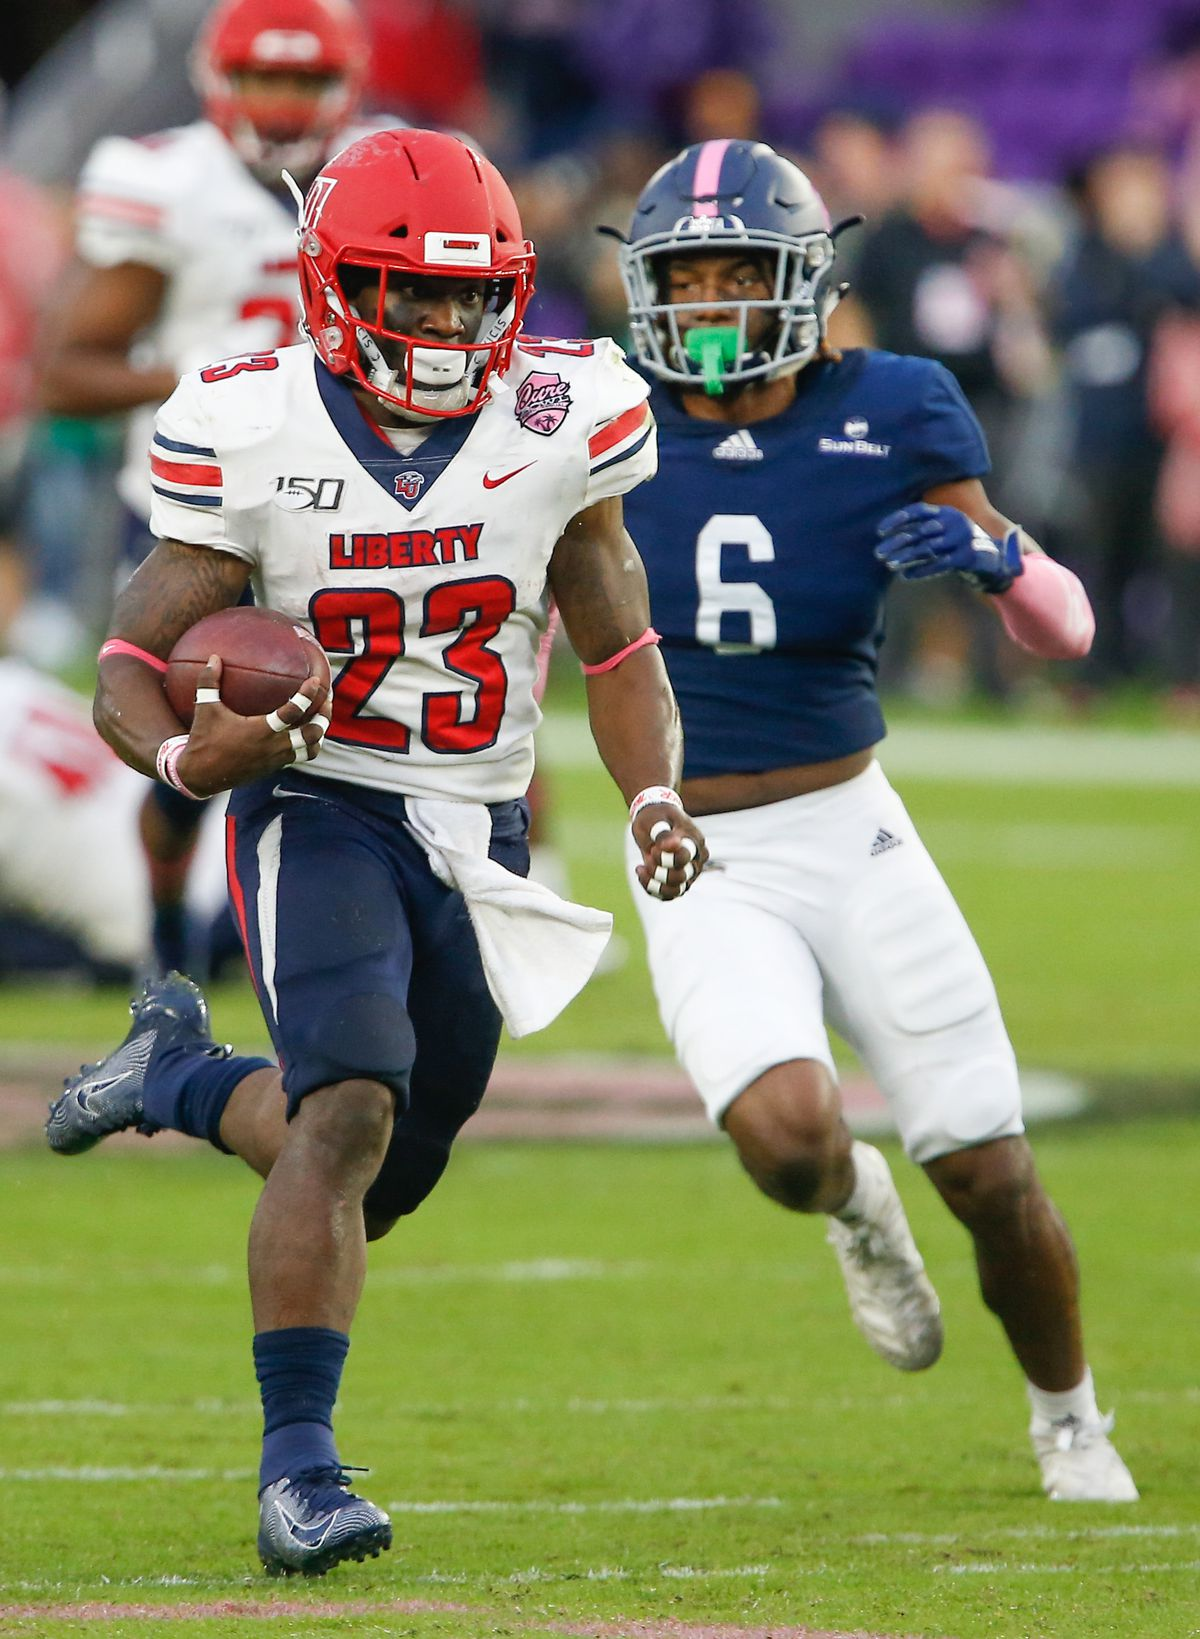 NCAA Football: Cure Bowl-Liberty vs Georgia Southern